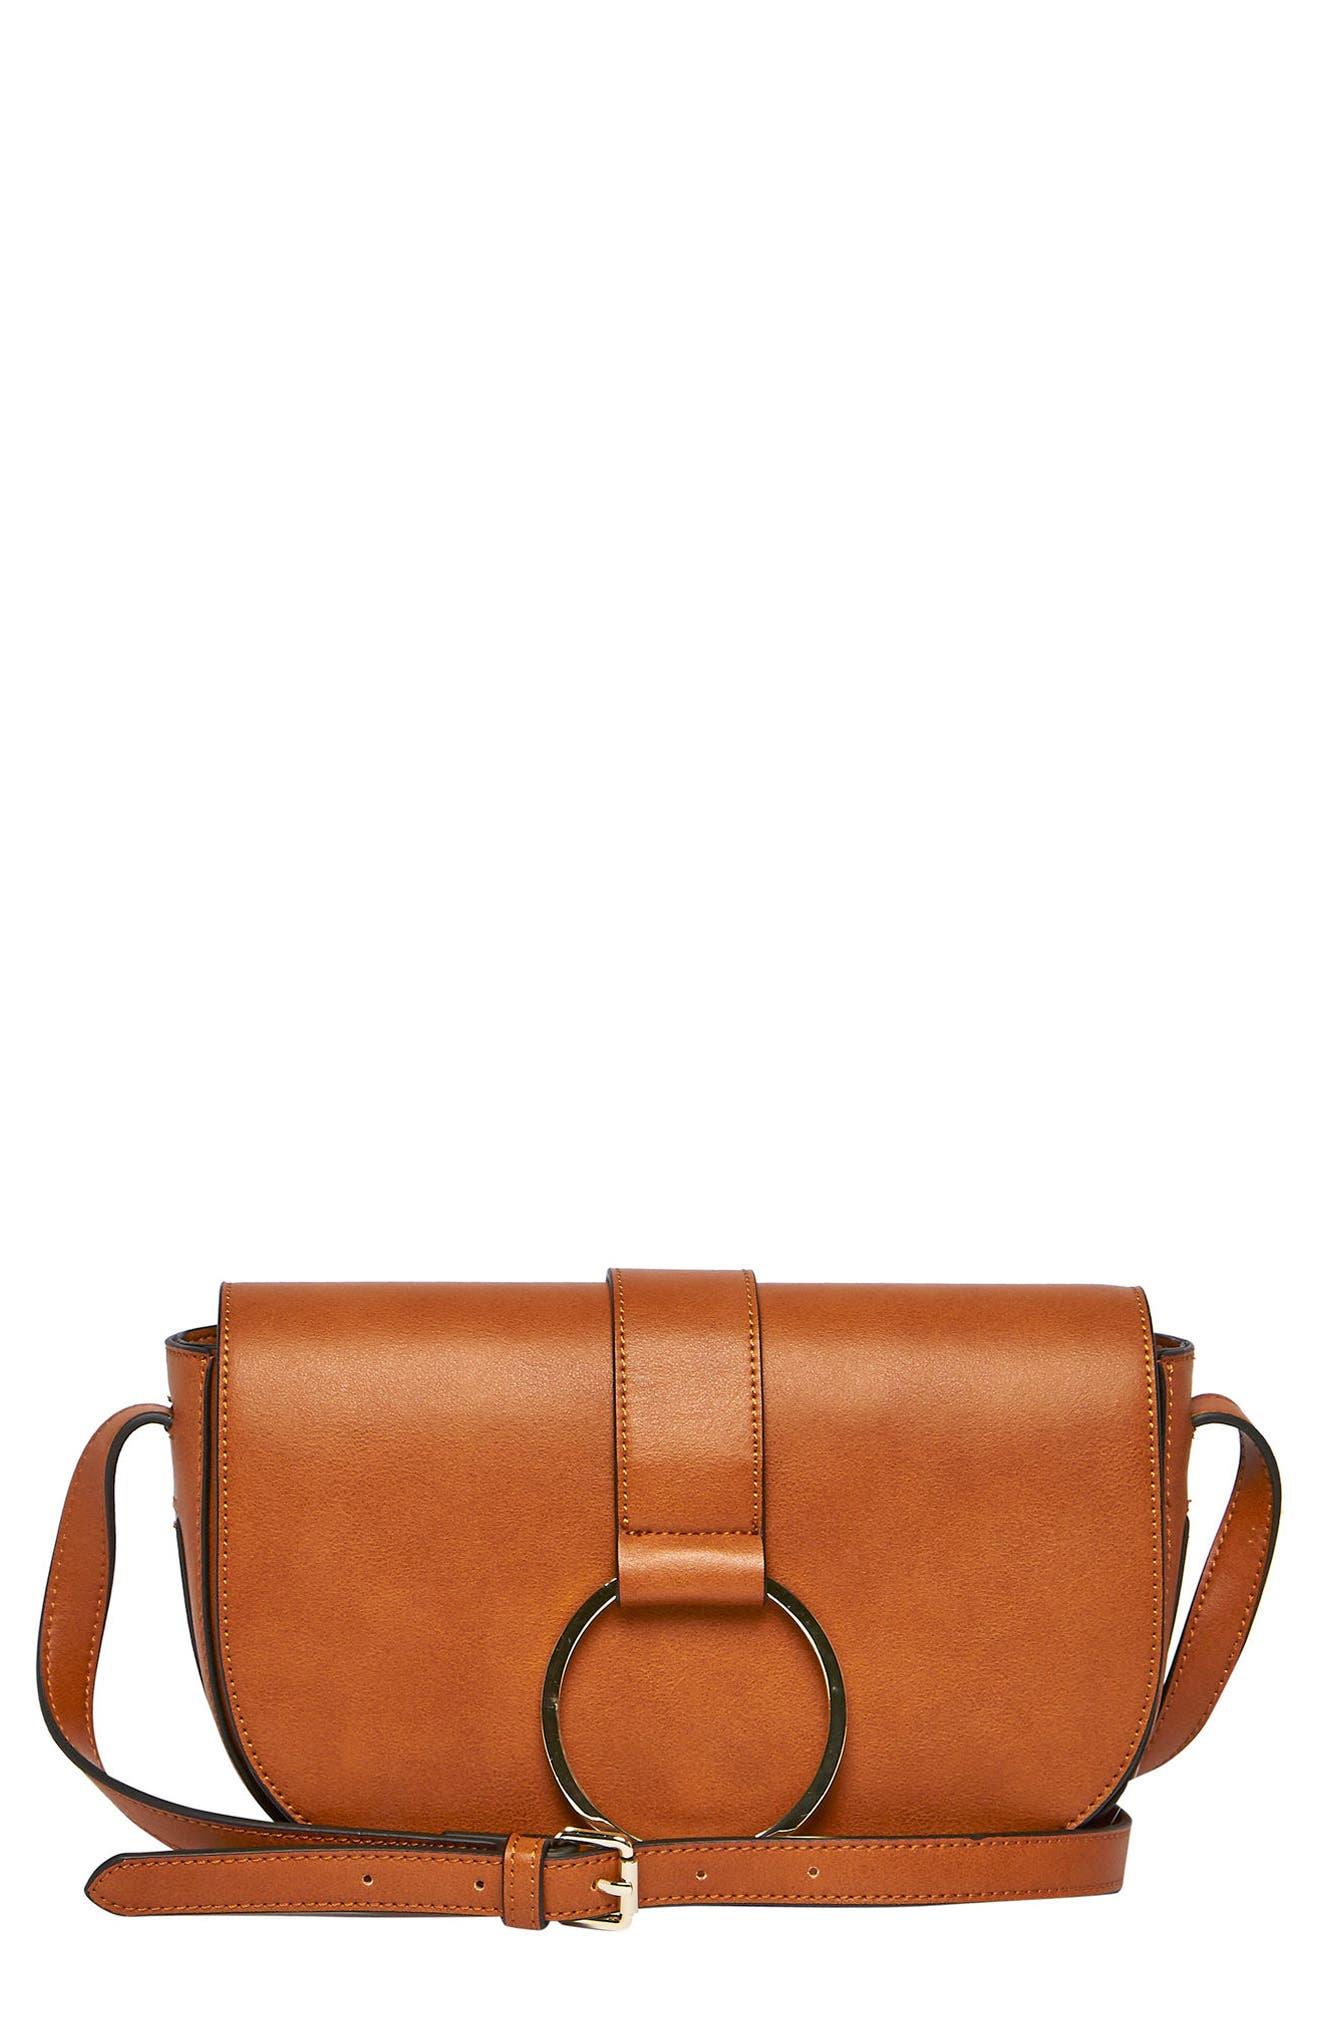 Lola Vegan Leather Crossbody Saddle Bag,                             Main thumbnail 1, color,                             TAN